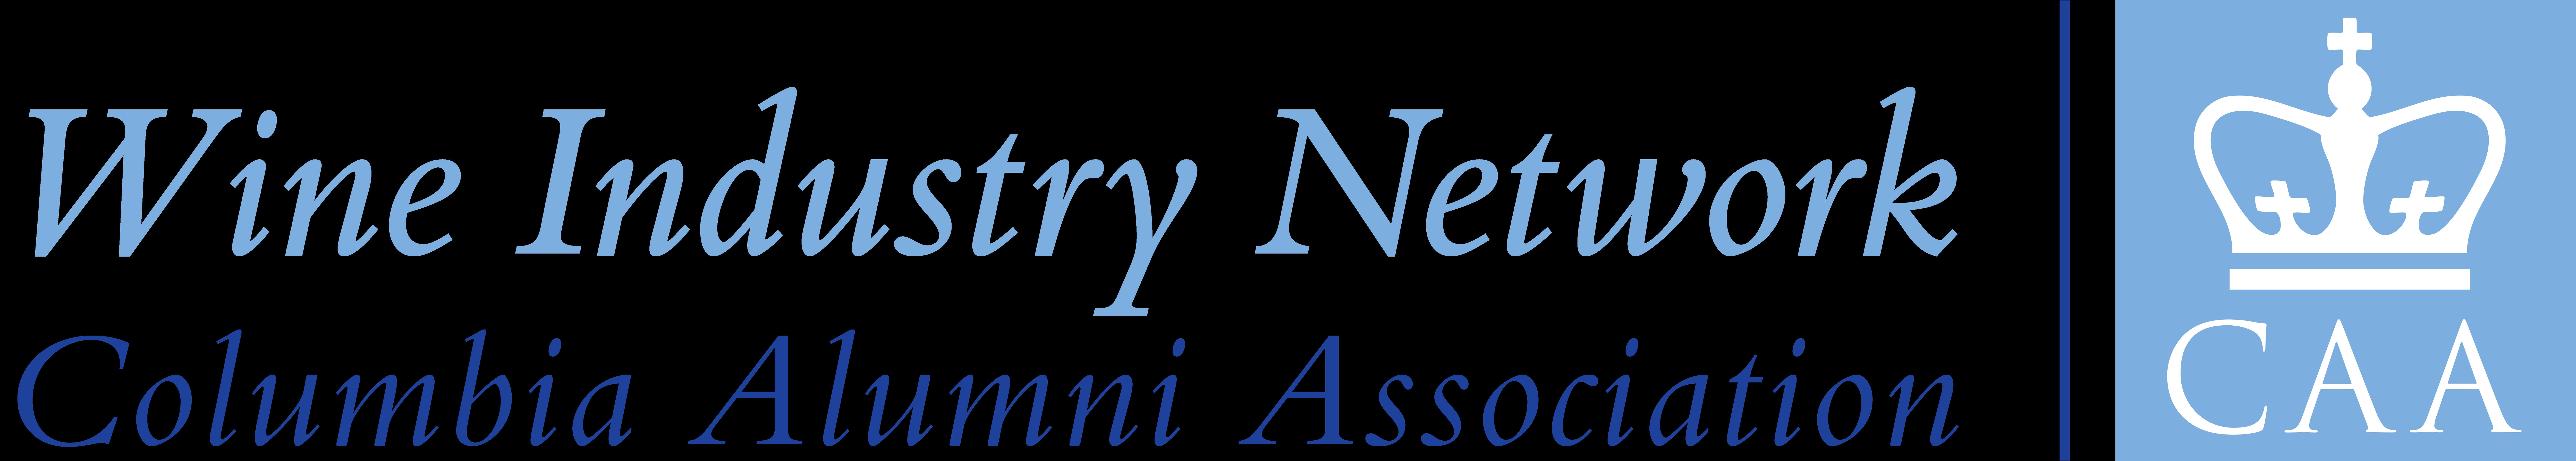 CAA_Wine_Industry_Nework_logo_68711_.png